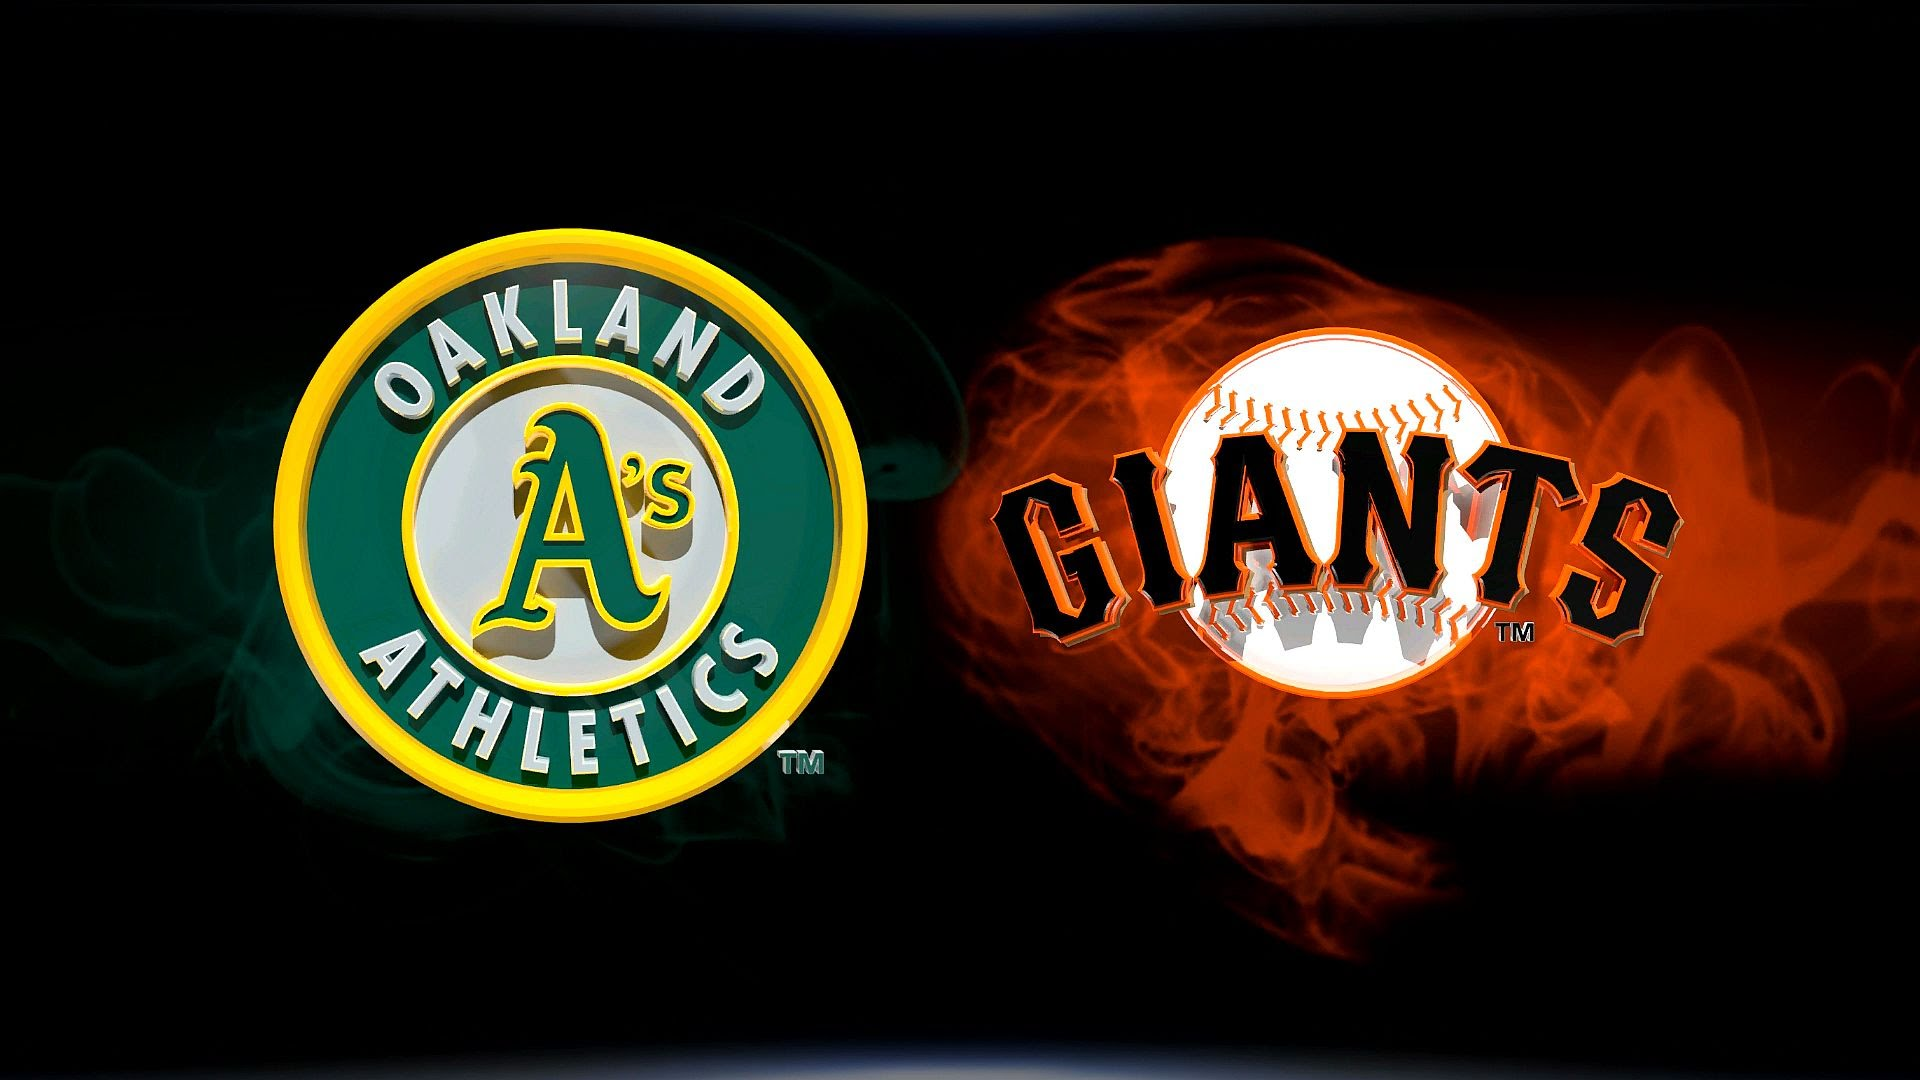 San Francisco Giants vs. Oakland Athletics Tickets 2018 - TixBag, San Francisco, California, United States